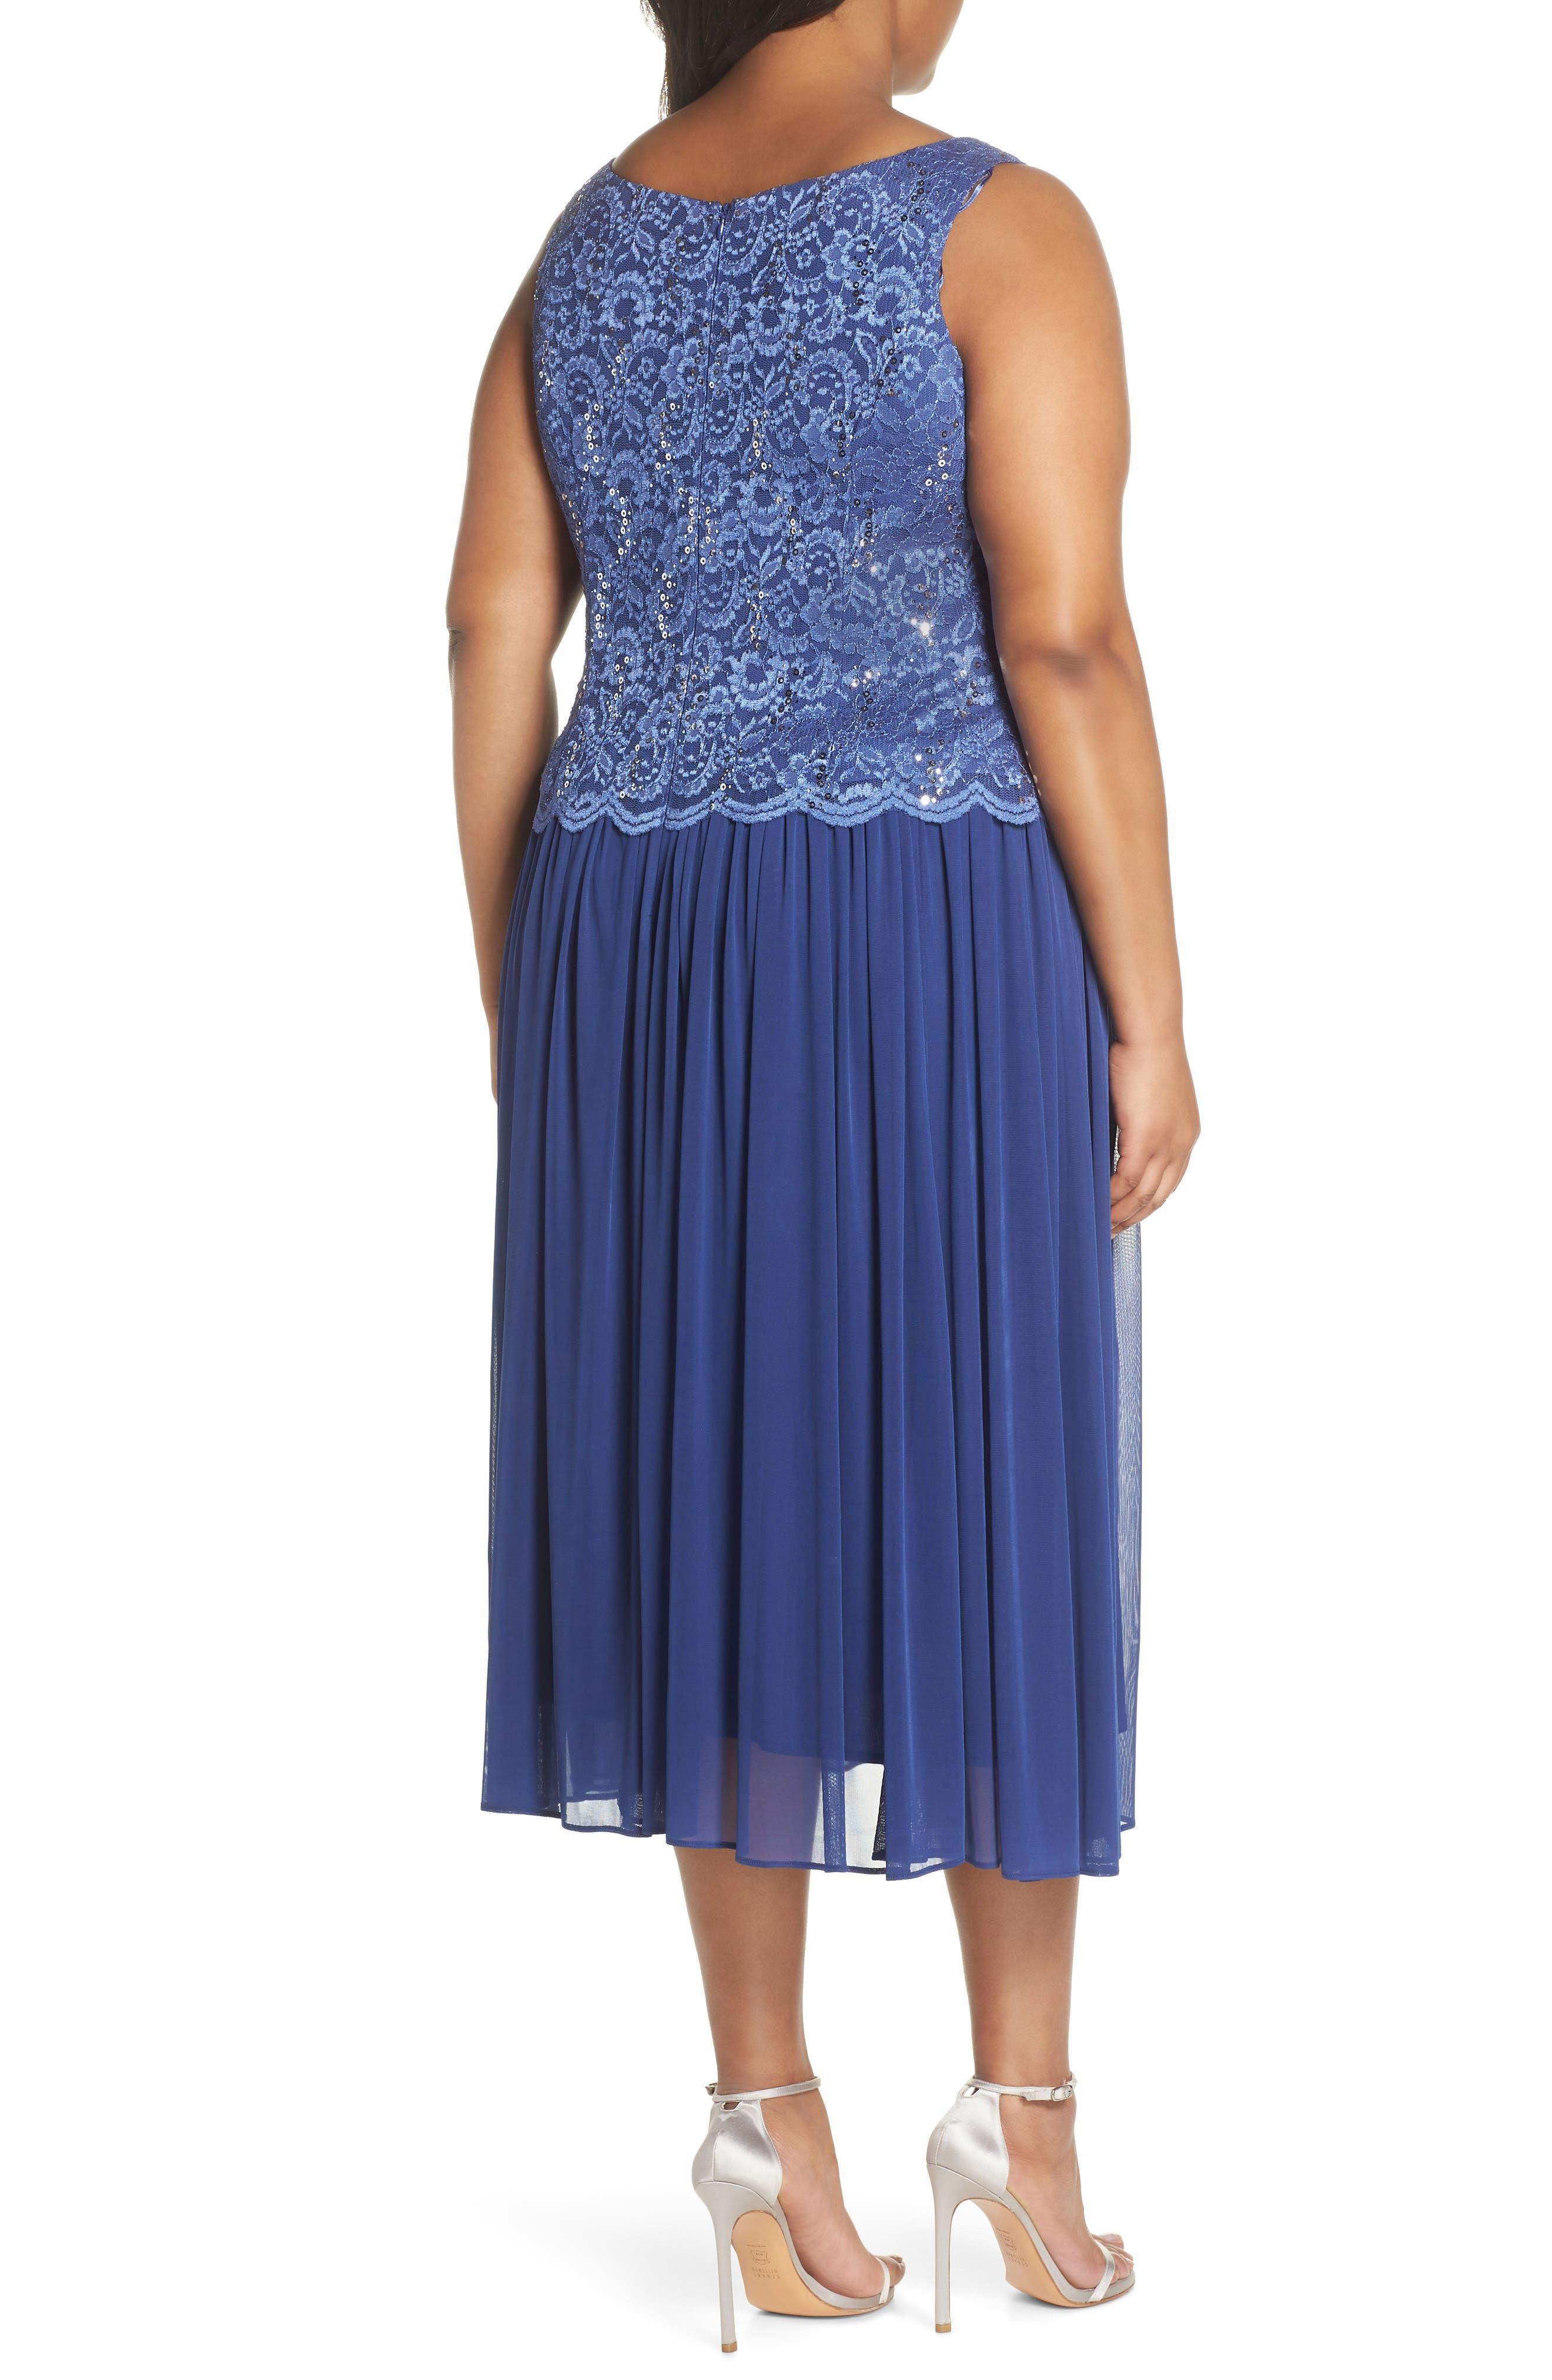 Lace Bodice Dress with Jacket,                             Alternate thumbnail 4, color,                             Violet